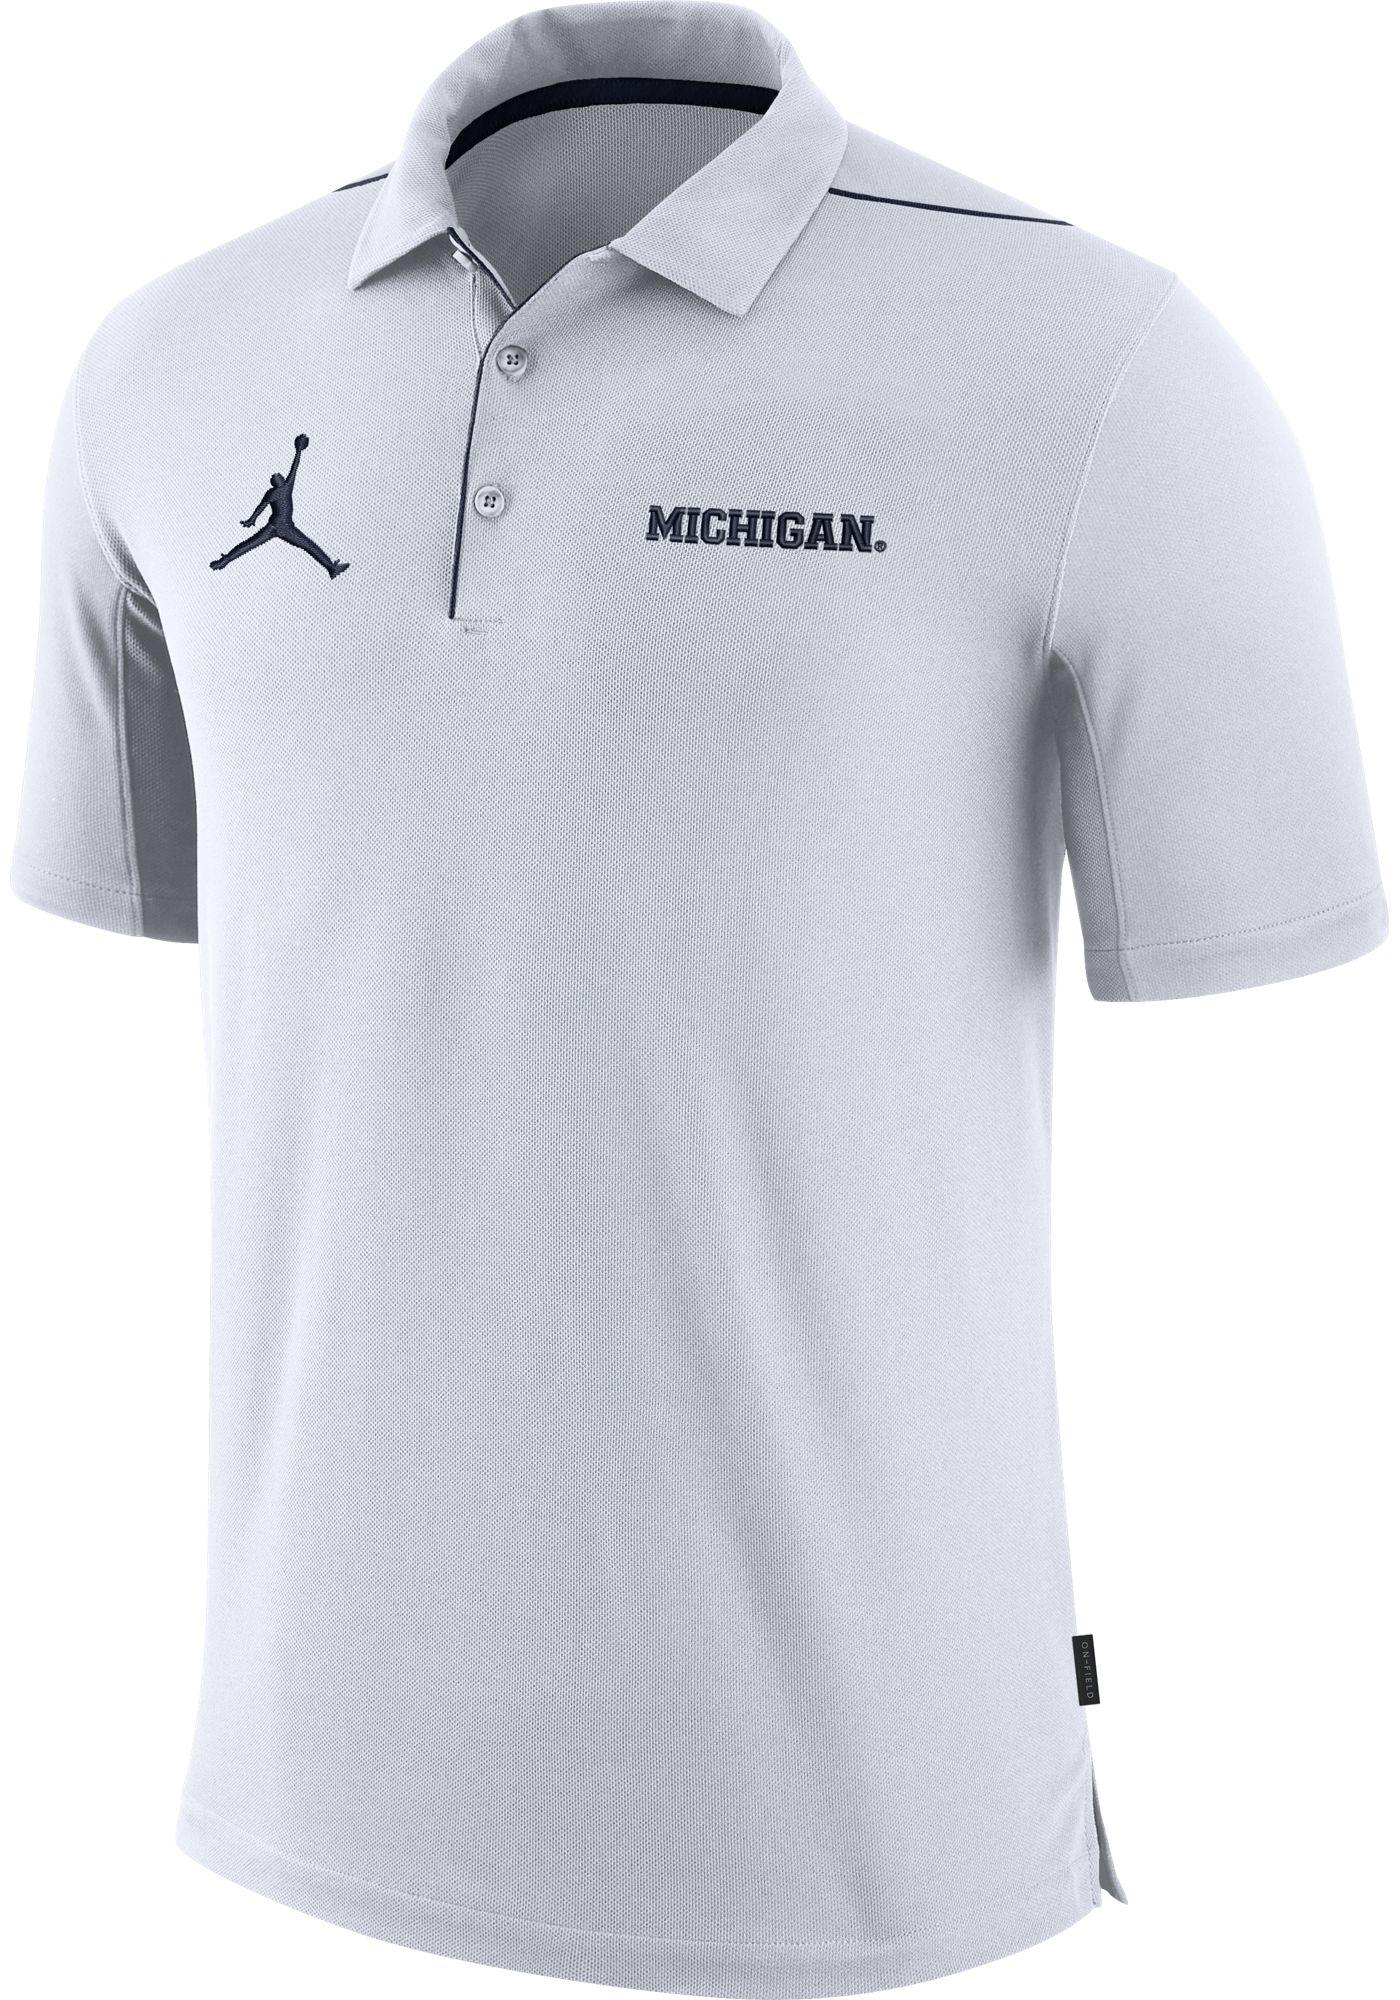 Jordan Men's Michigan Wolverines Team Issue Football Sideline White Polo